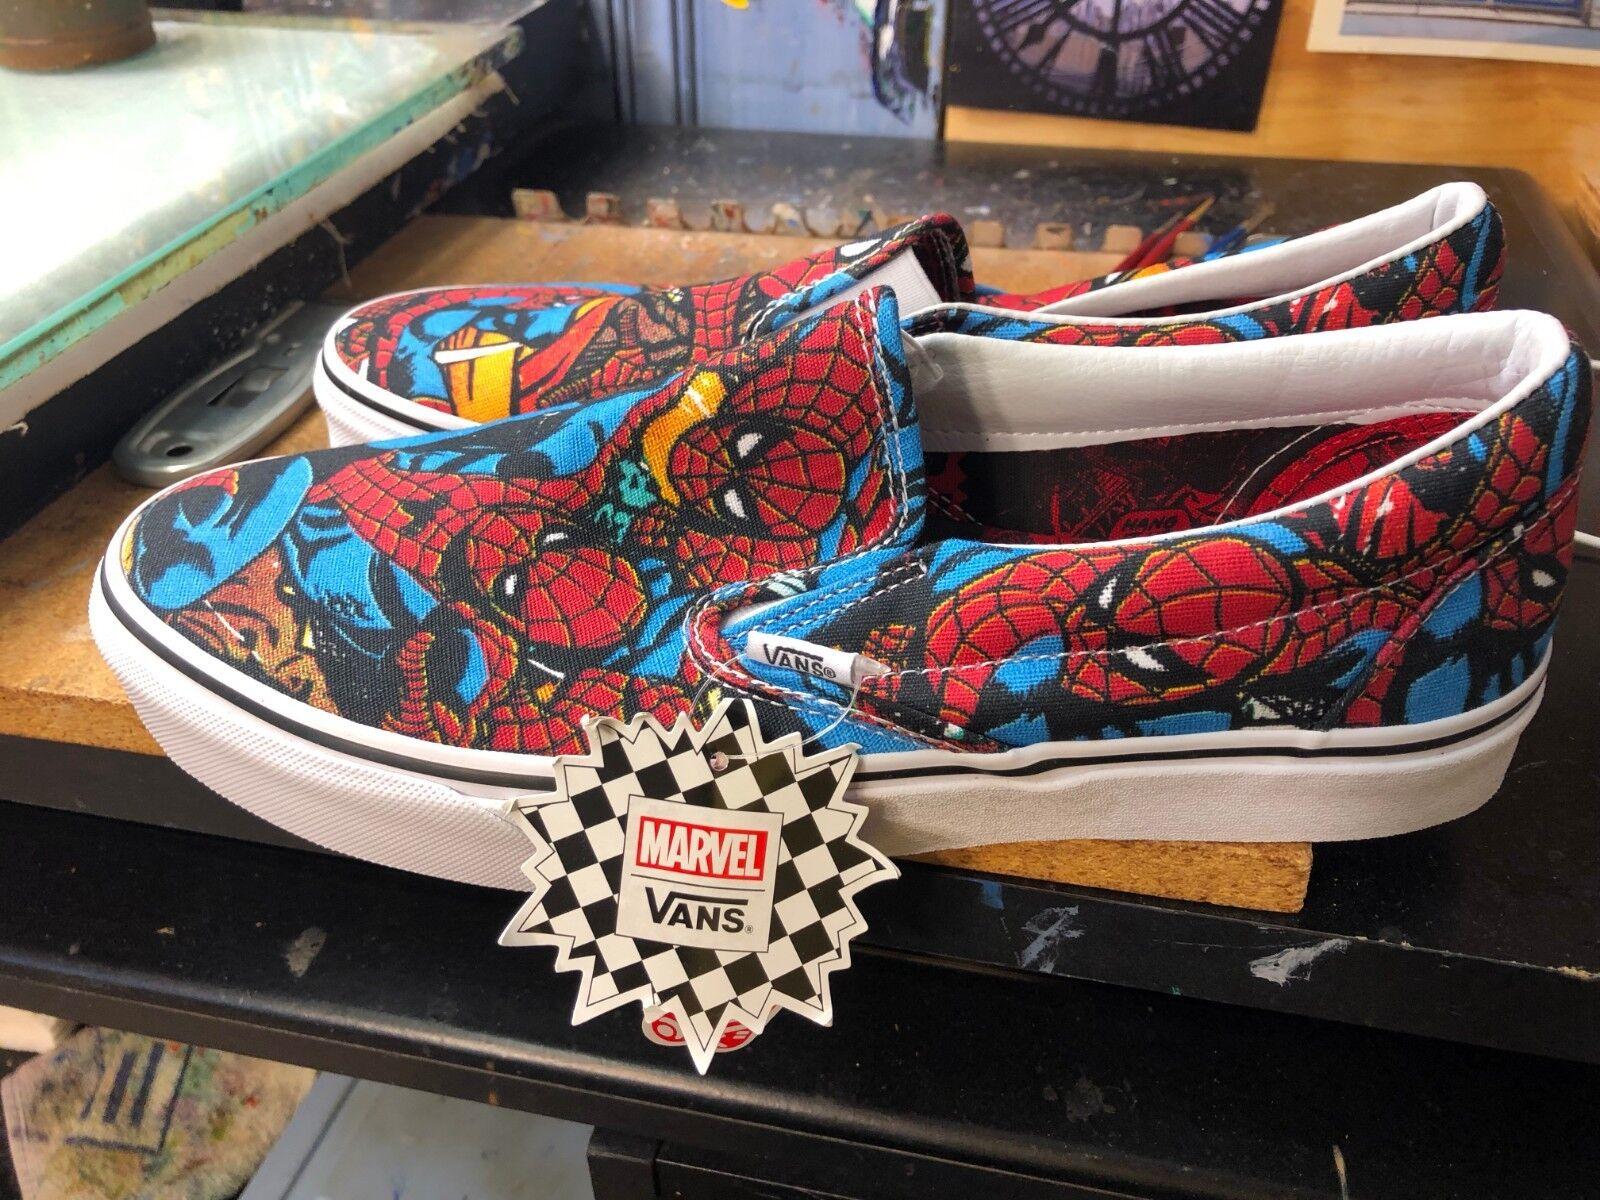 Vans Clásico Slip-On (Marvel) Spider Man Negro de EE. UU. para hombres VN0A38F79H7